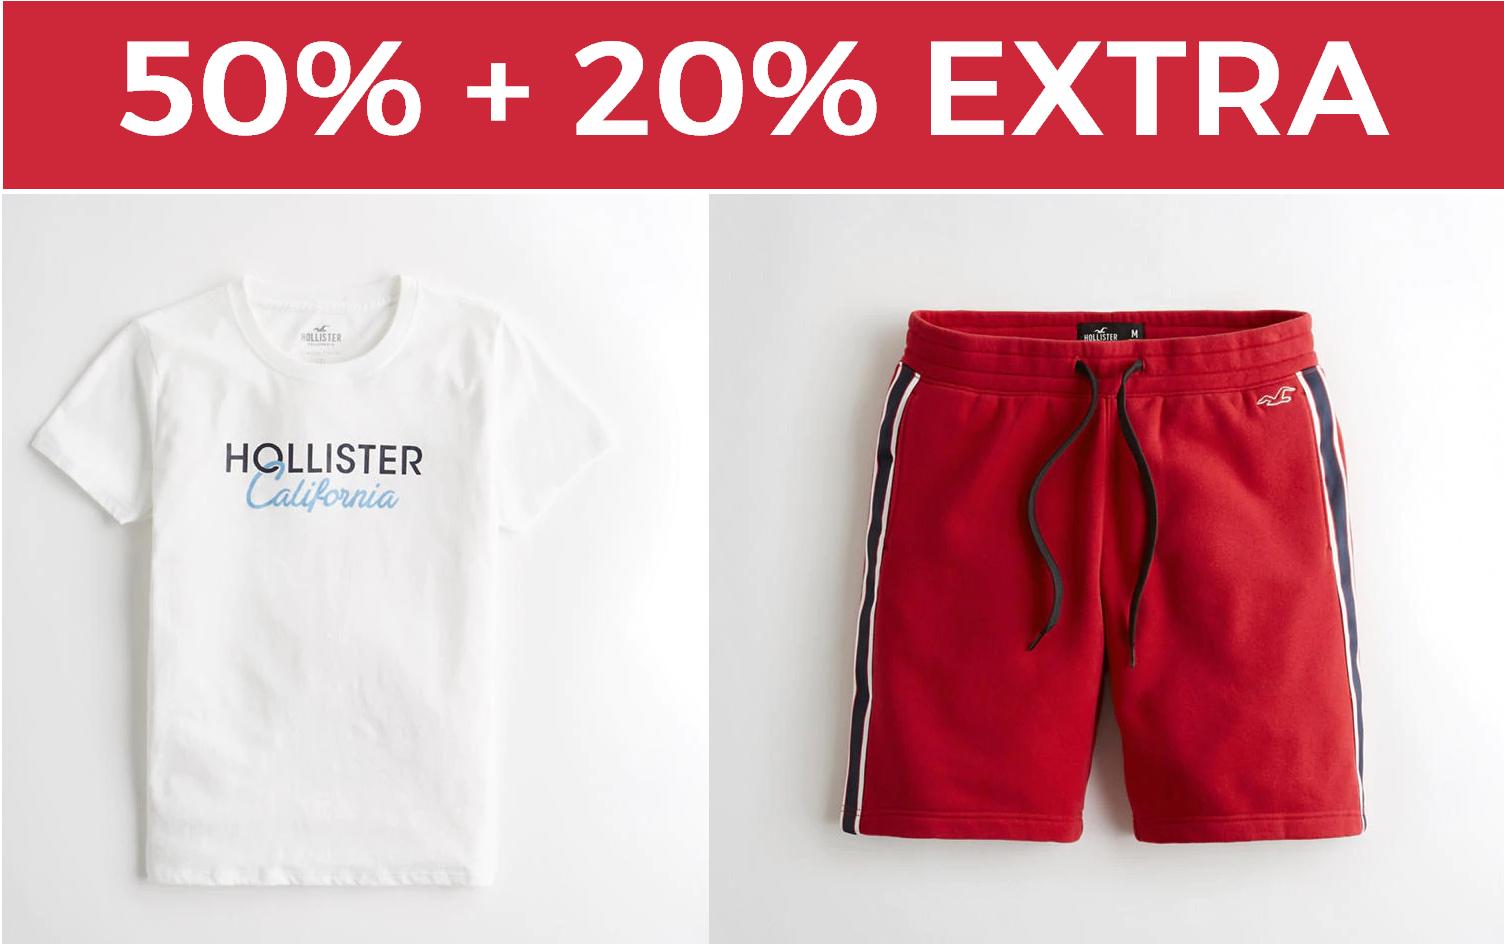 50% + 20% EXTRA en Hollister